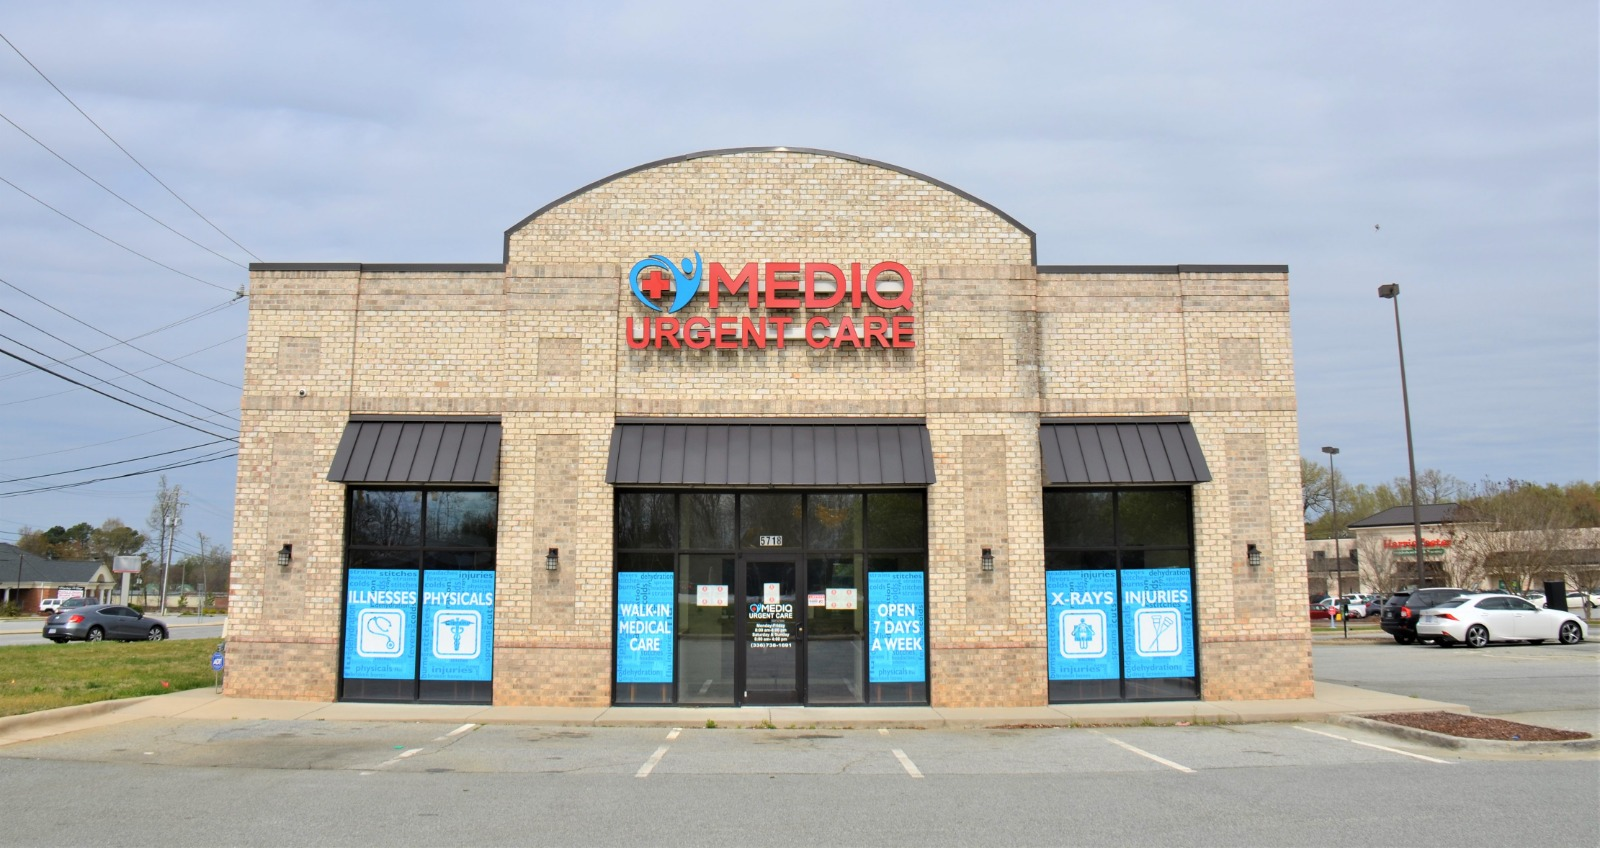 Mediq Urgent Care Greensboro exterior